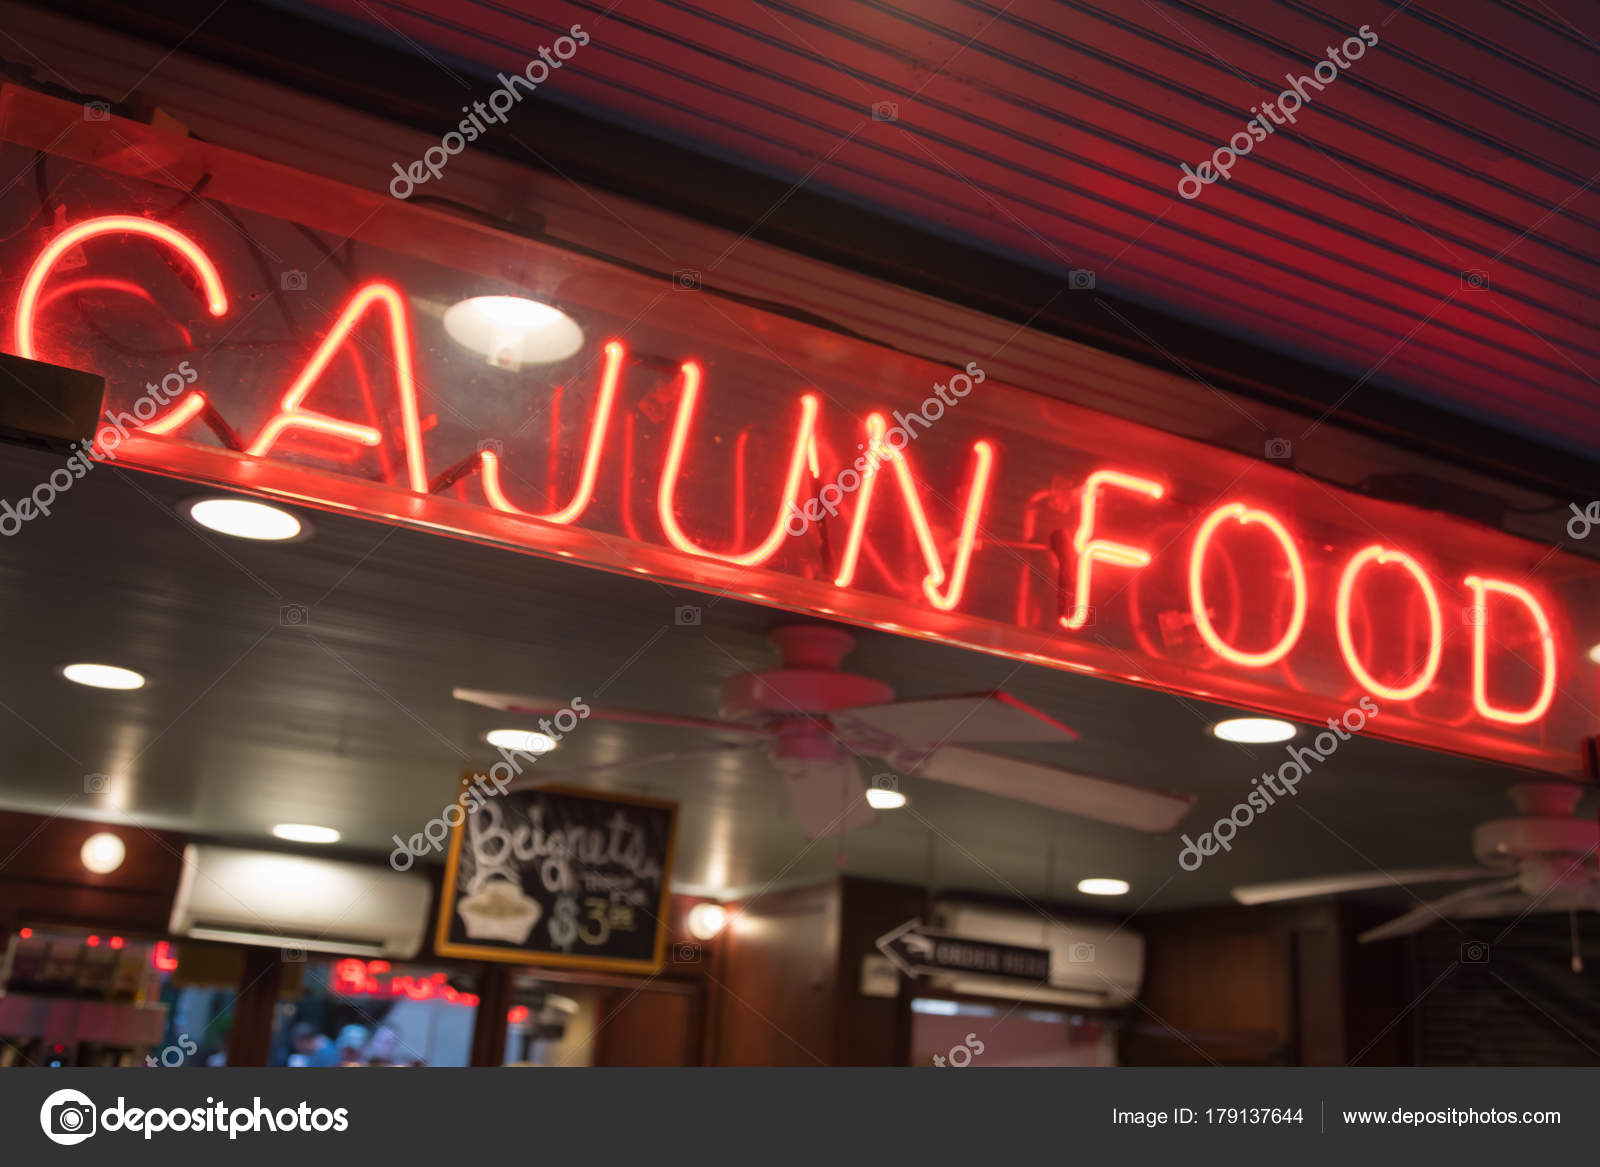 Cajun Food Neon Sign In New Orleans Louisiana Restaurant